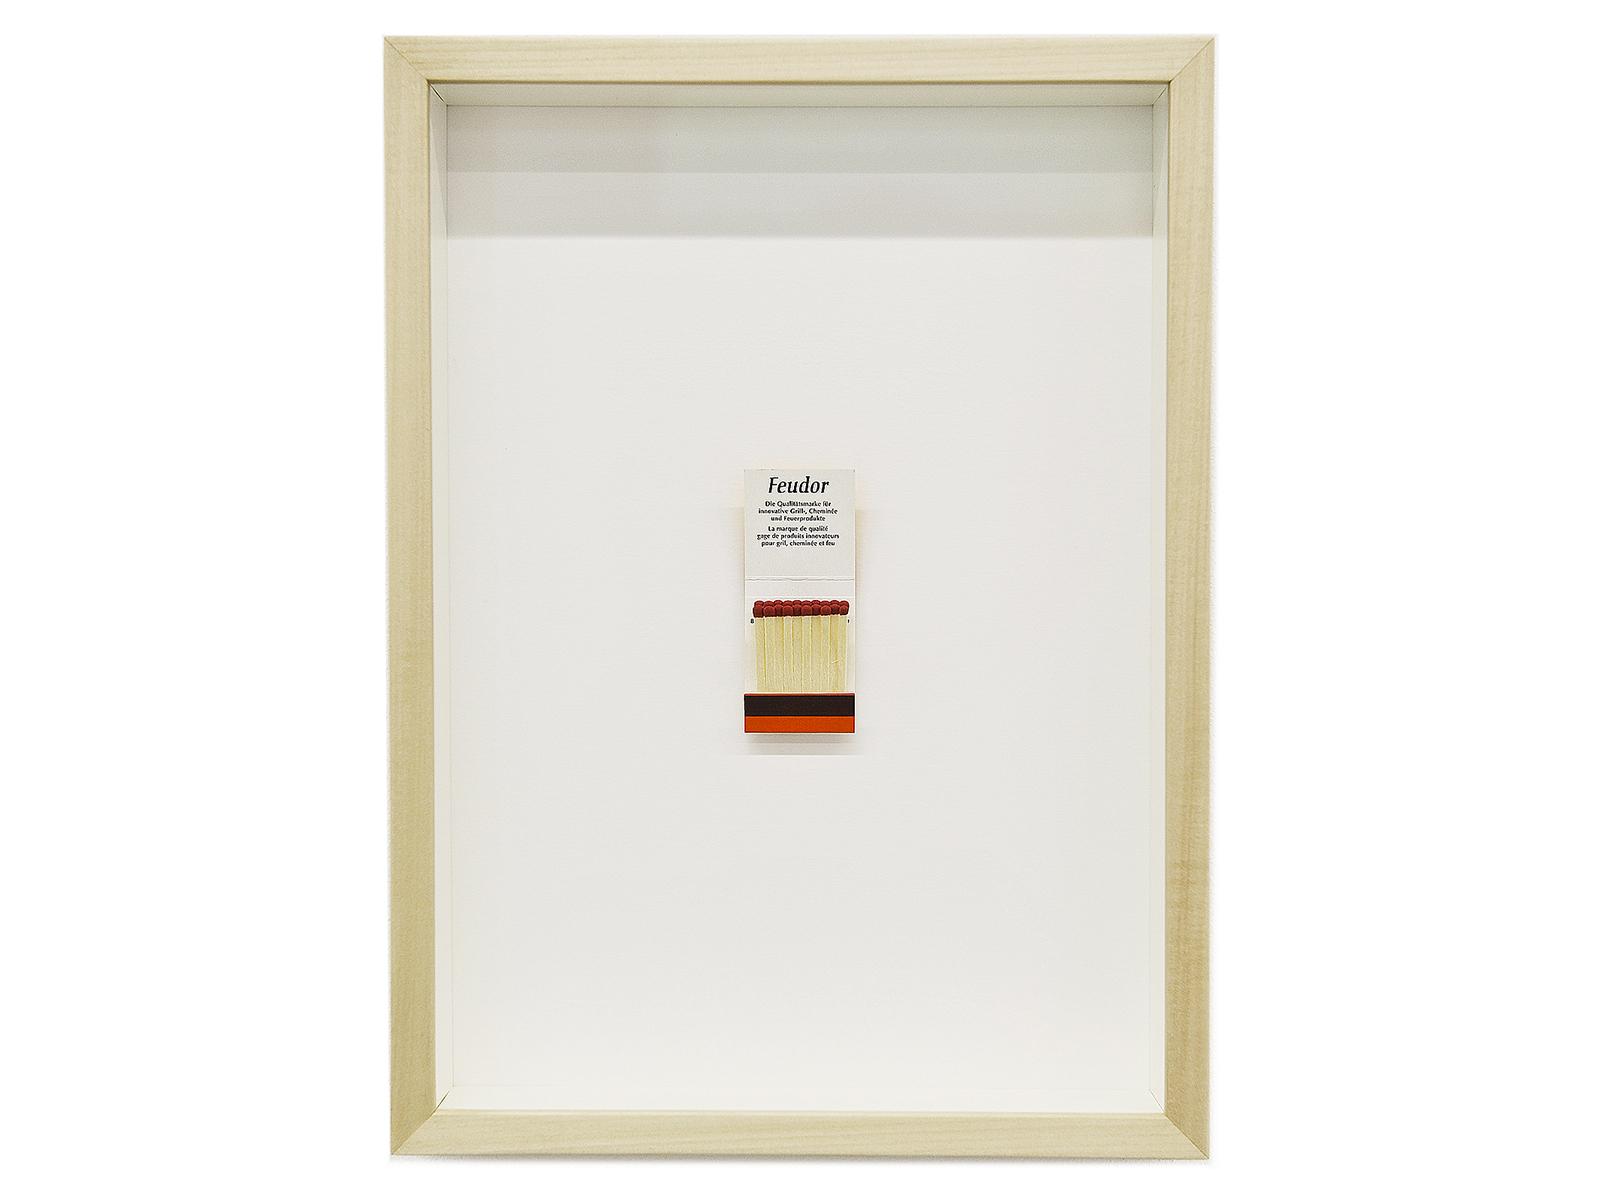 Benoit-Delaunay-artiste-installations-Un-Sentiment-de-Chaleur-03